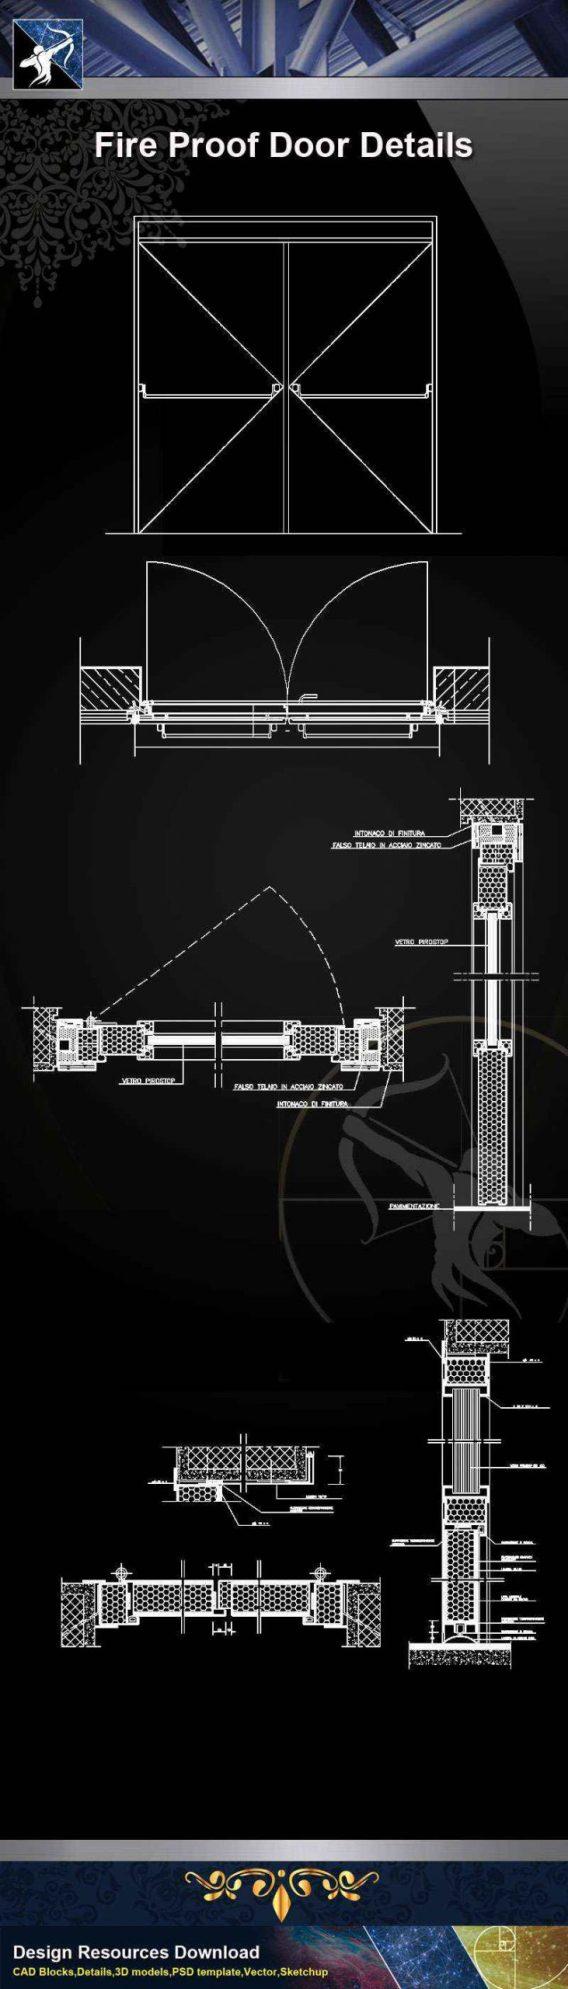 【Architecture CAD Details Collections】Fire Proof Door CAD Details